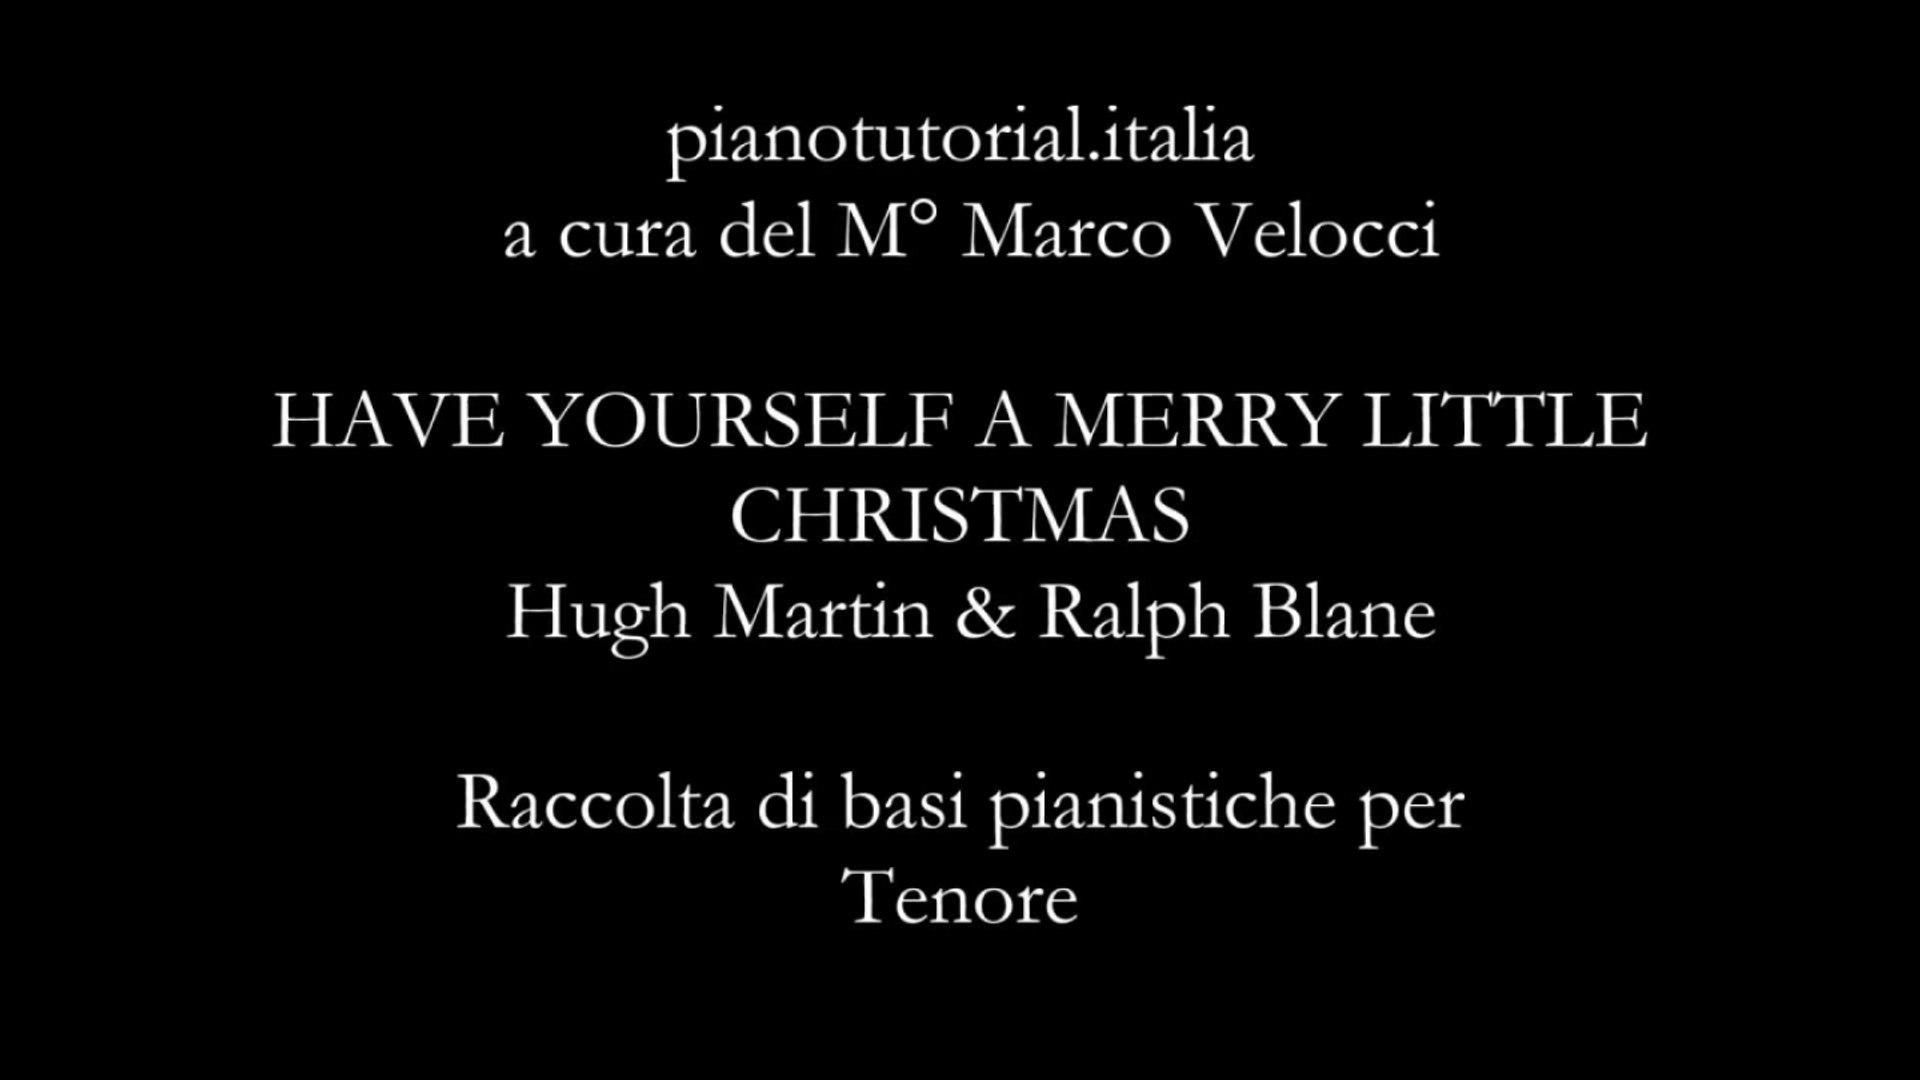 HAVE YOURSELF A MERRY LITTLE CHRISTMAS - H. Martin & R. Blane - Raccolta di basi pianistiche